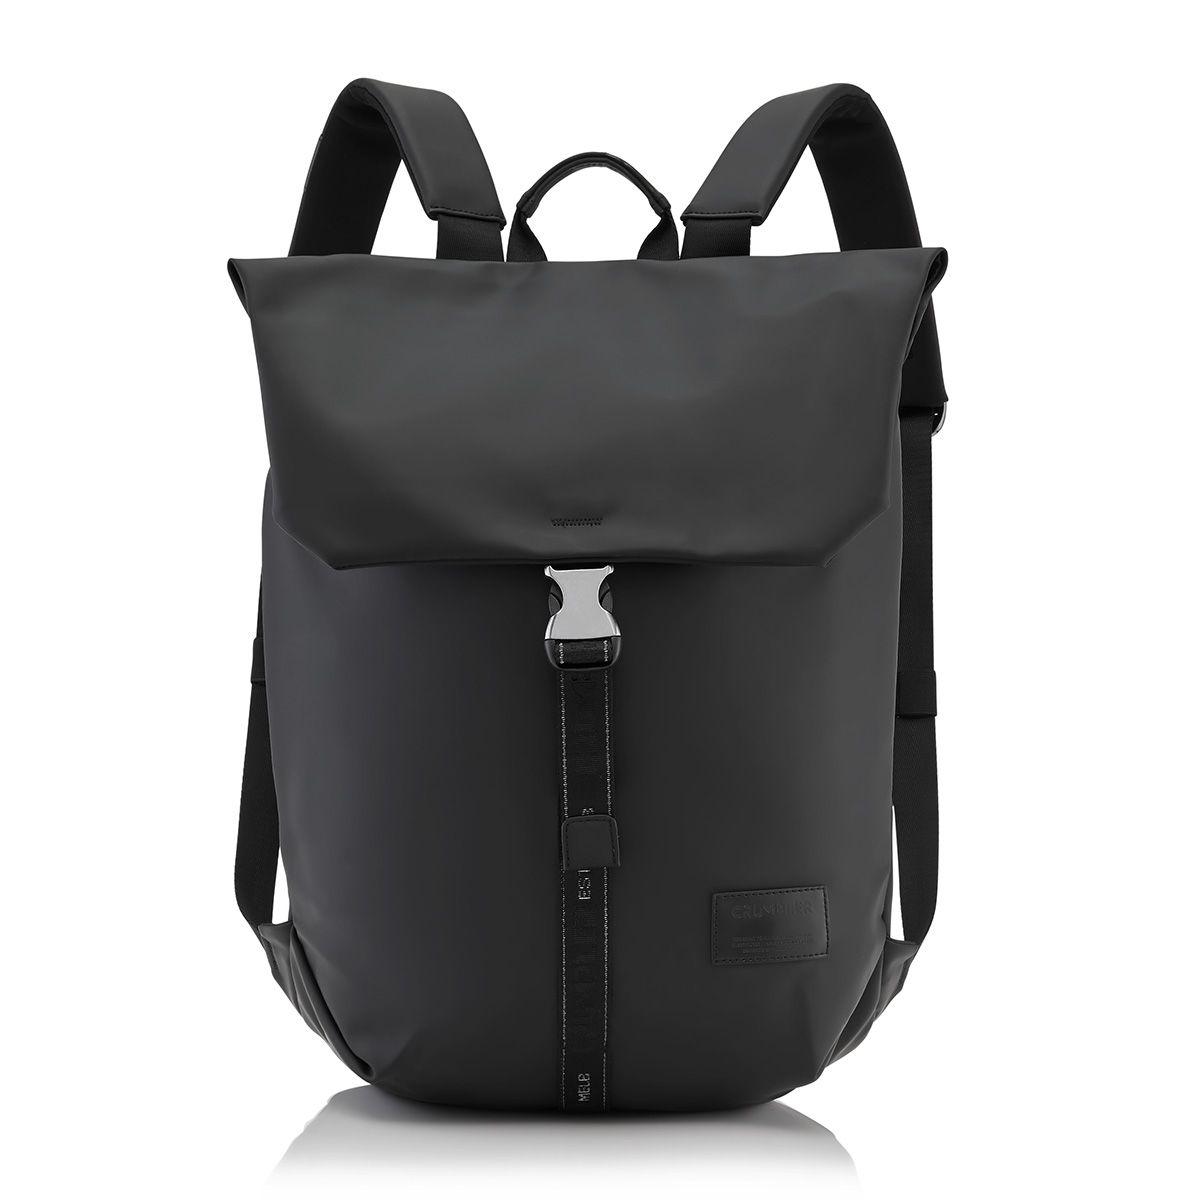 Crumpler backpack sprout black backpacks leather